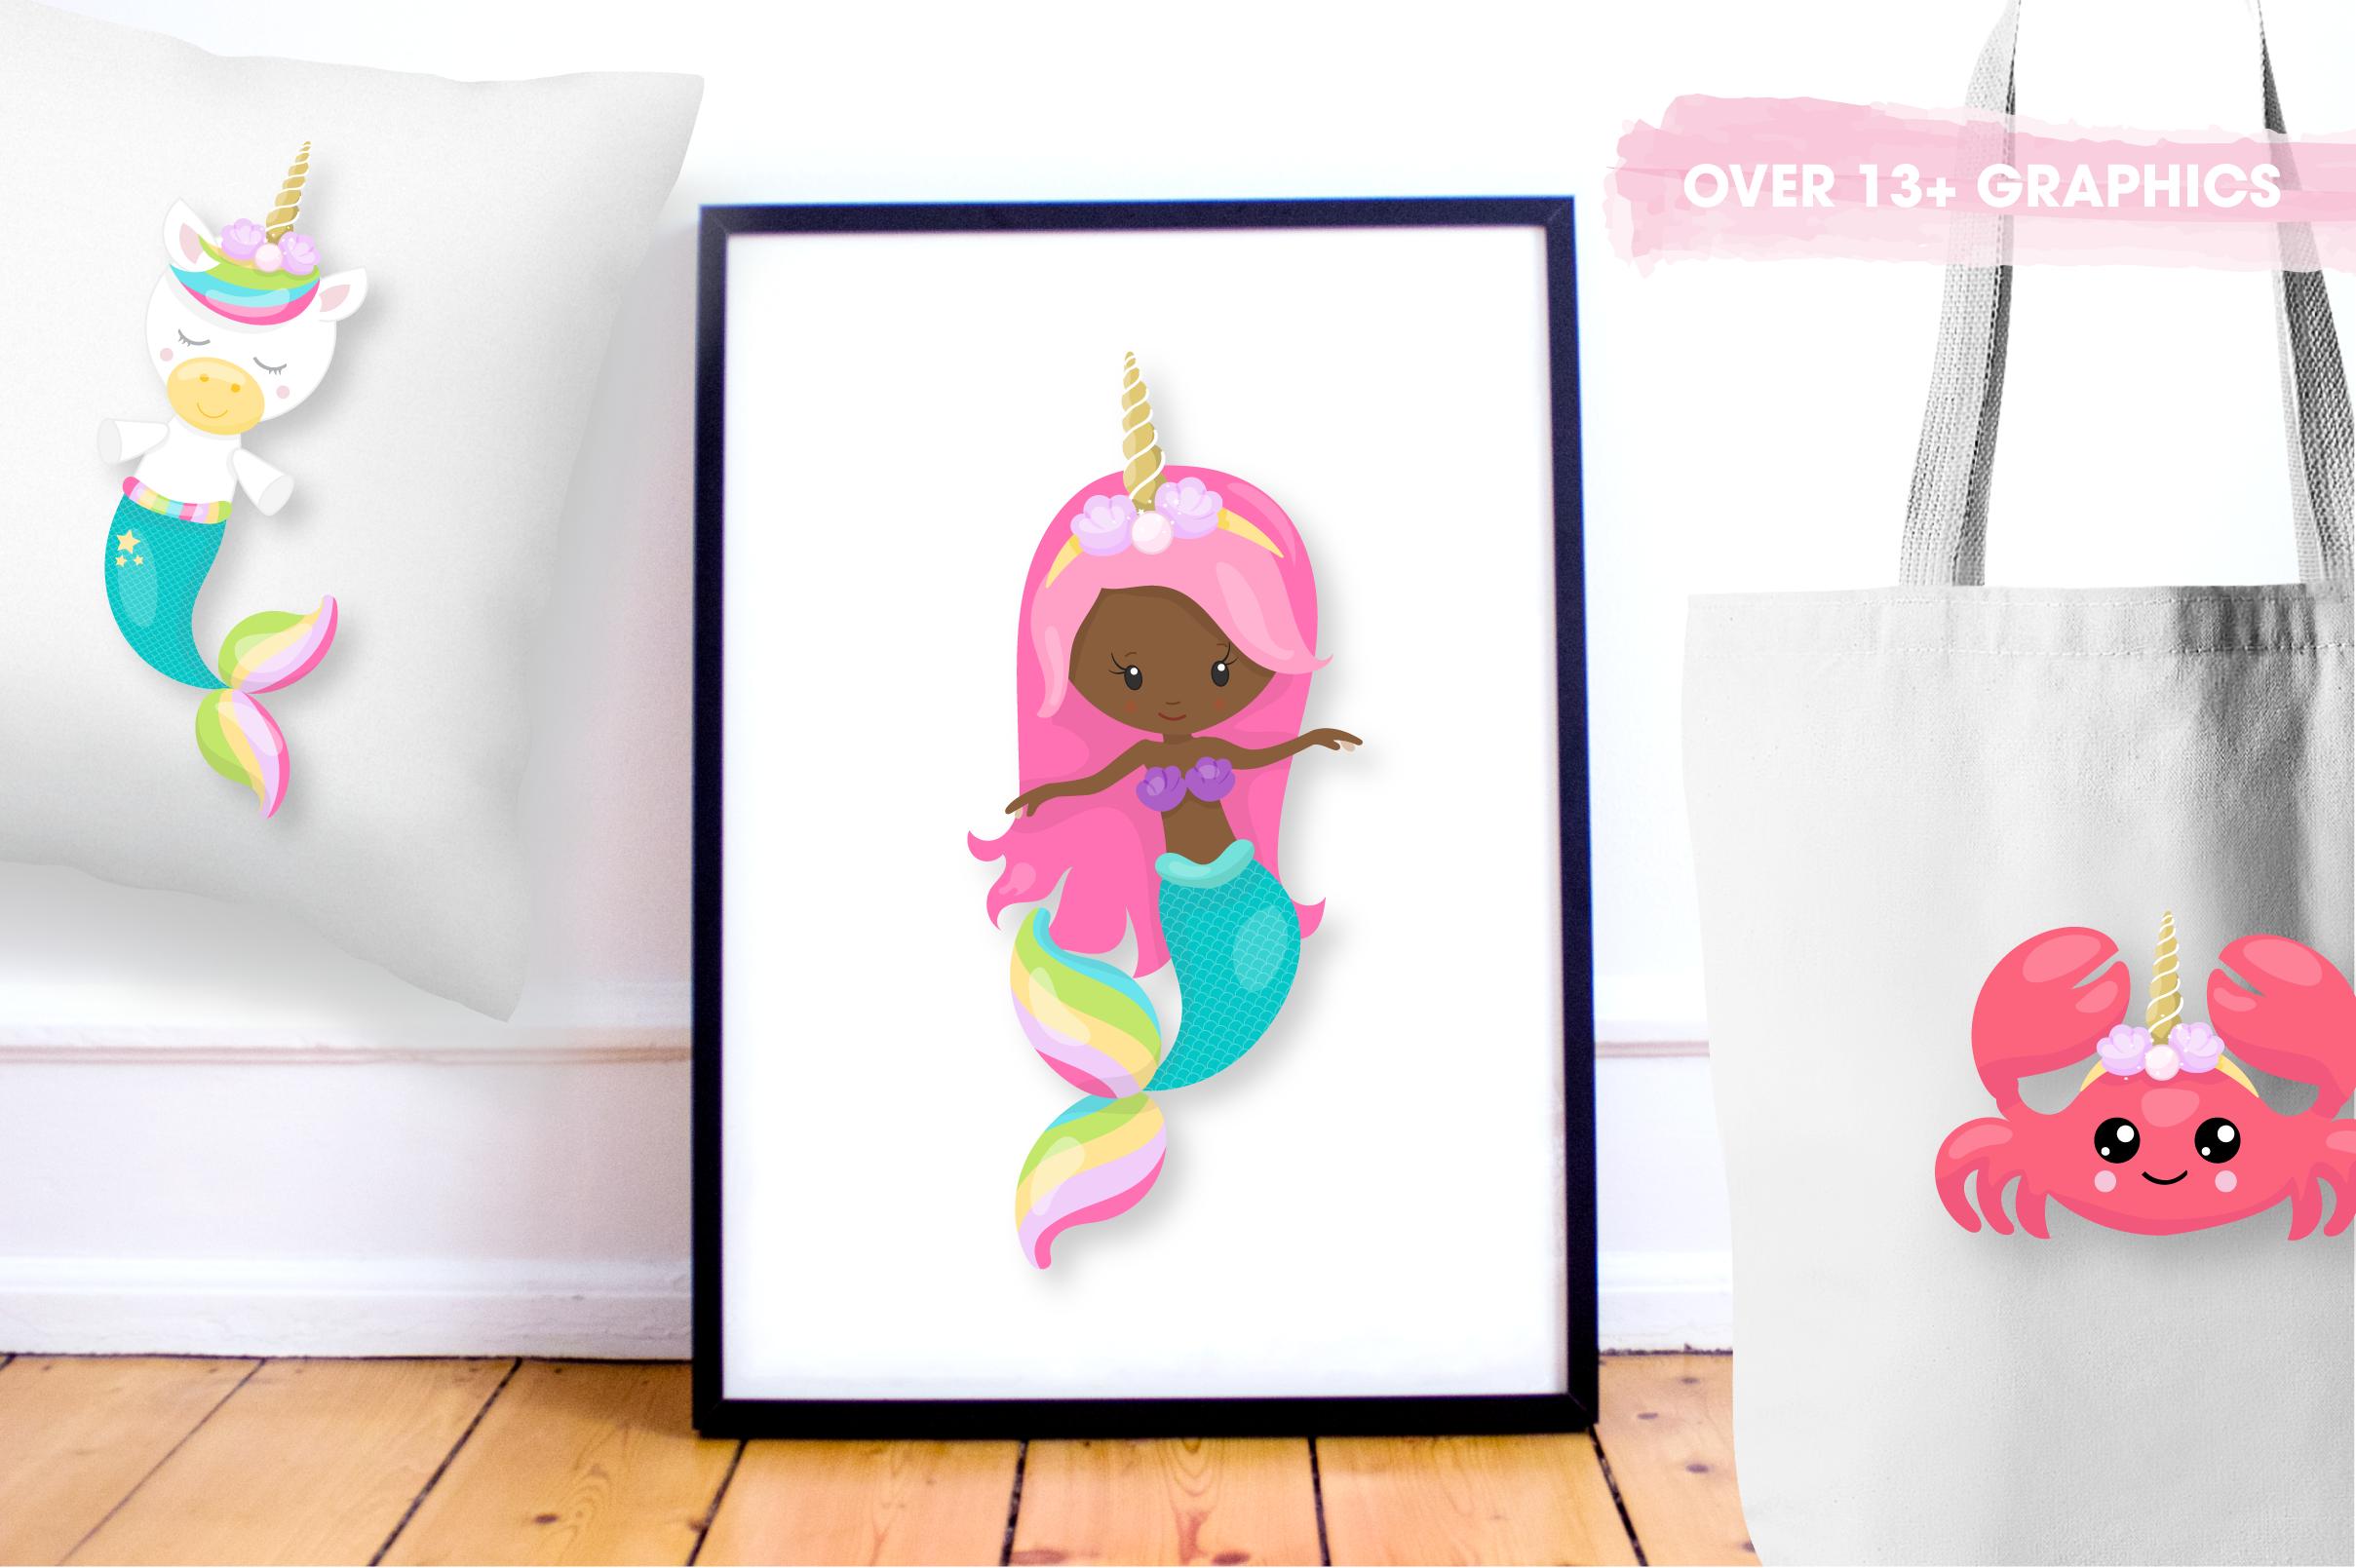 unicorn mermaid graphics and illustrations example image 2